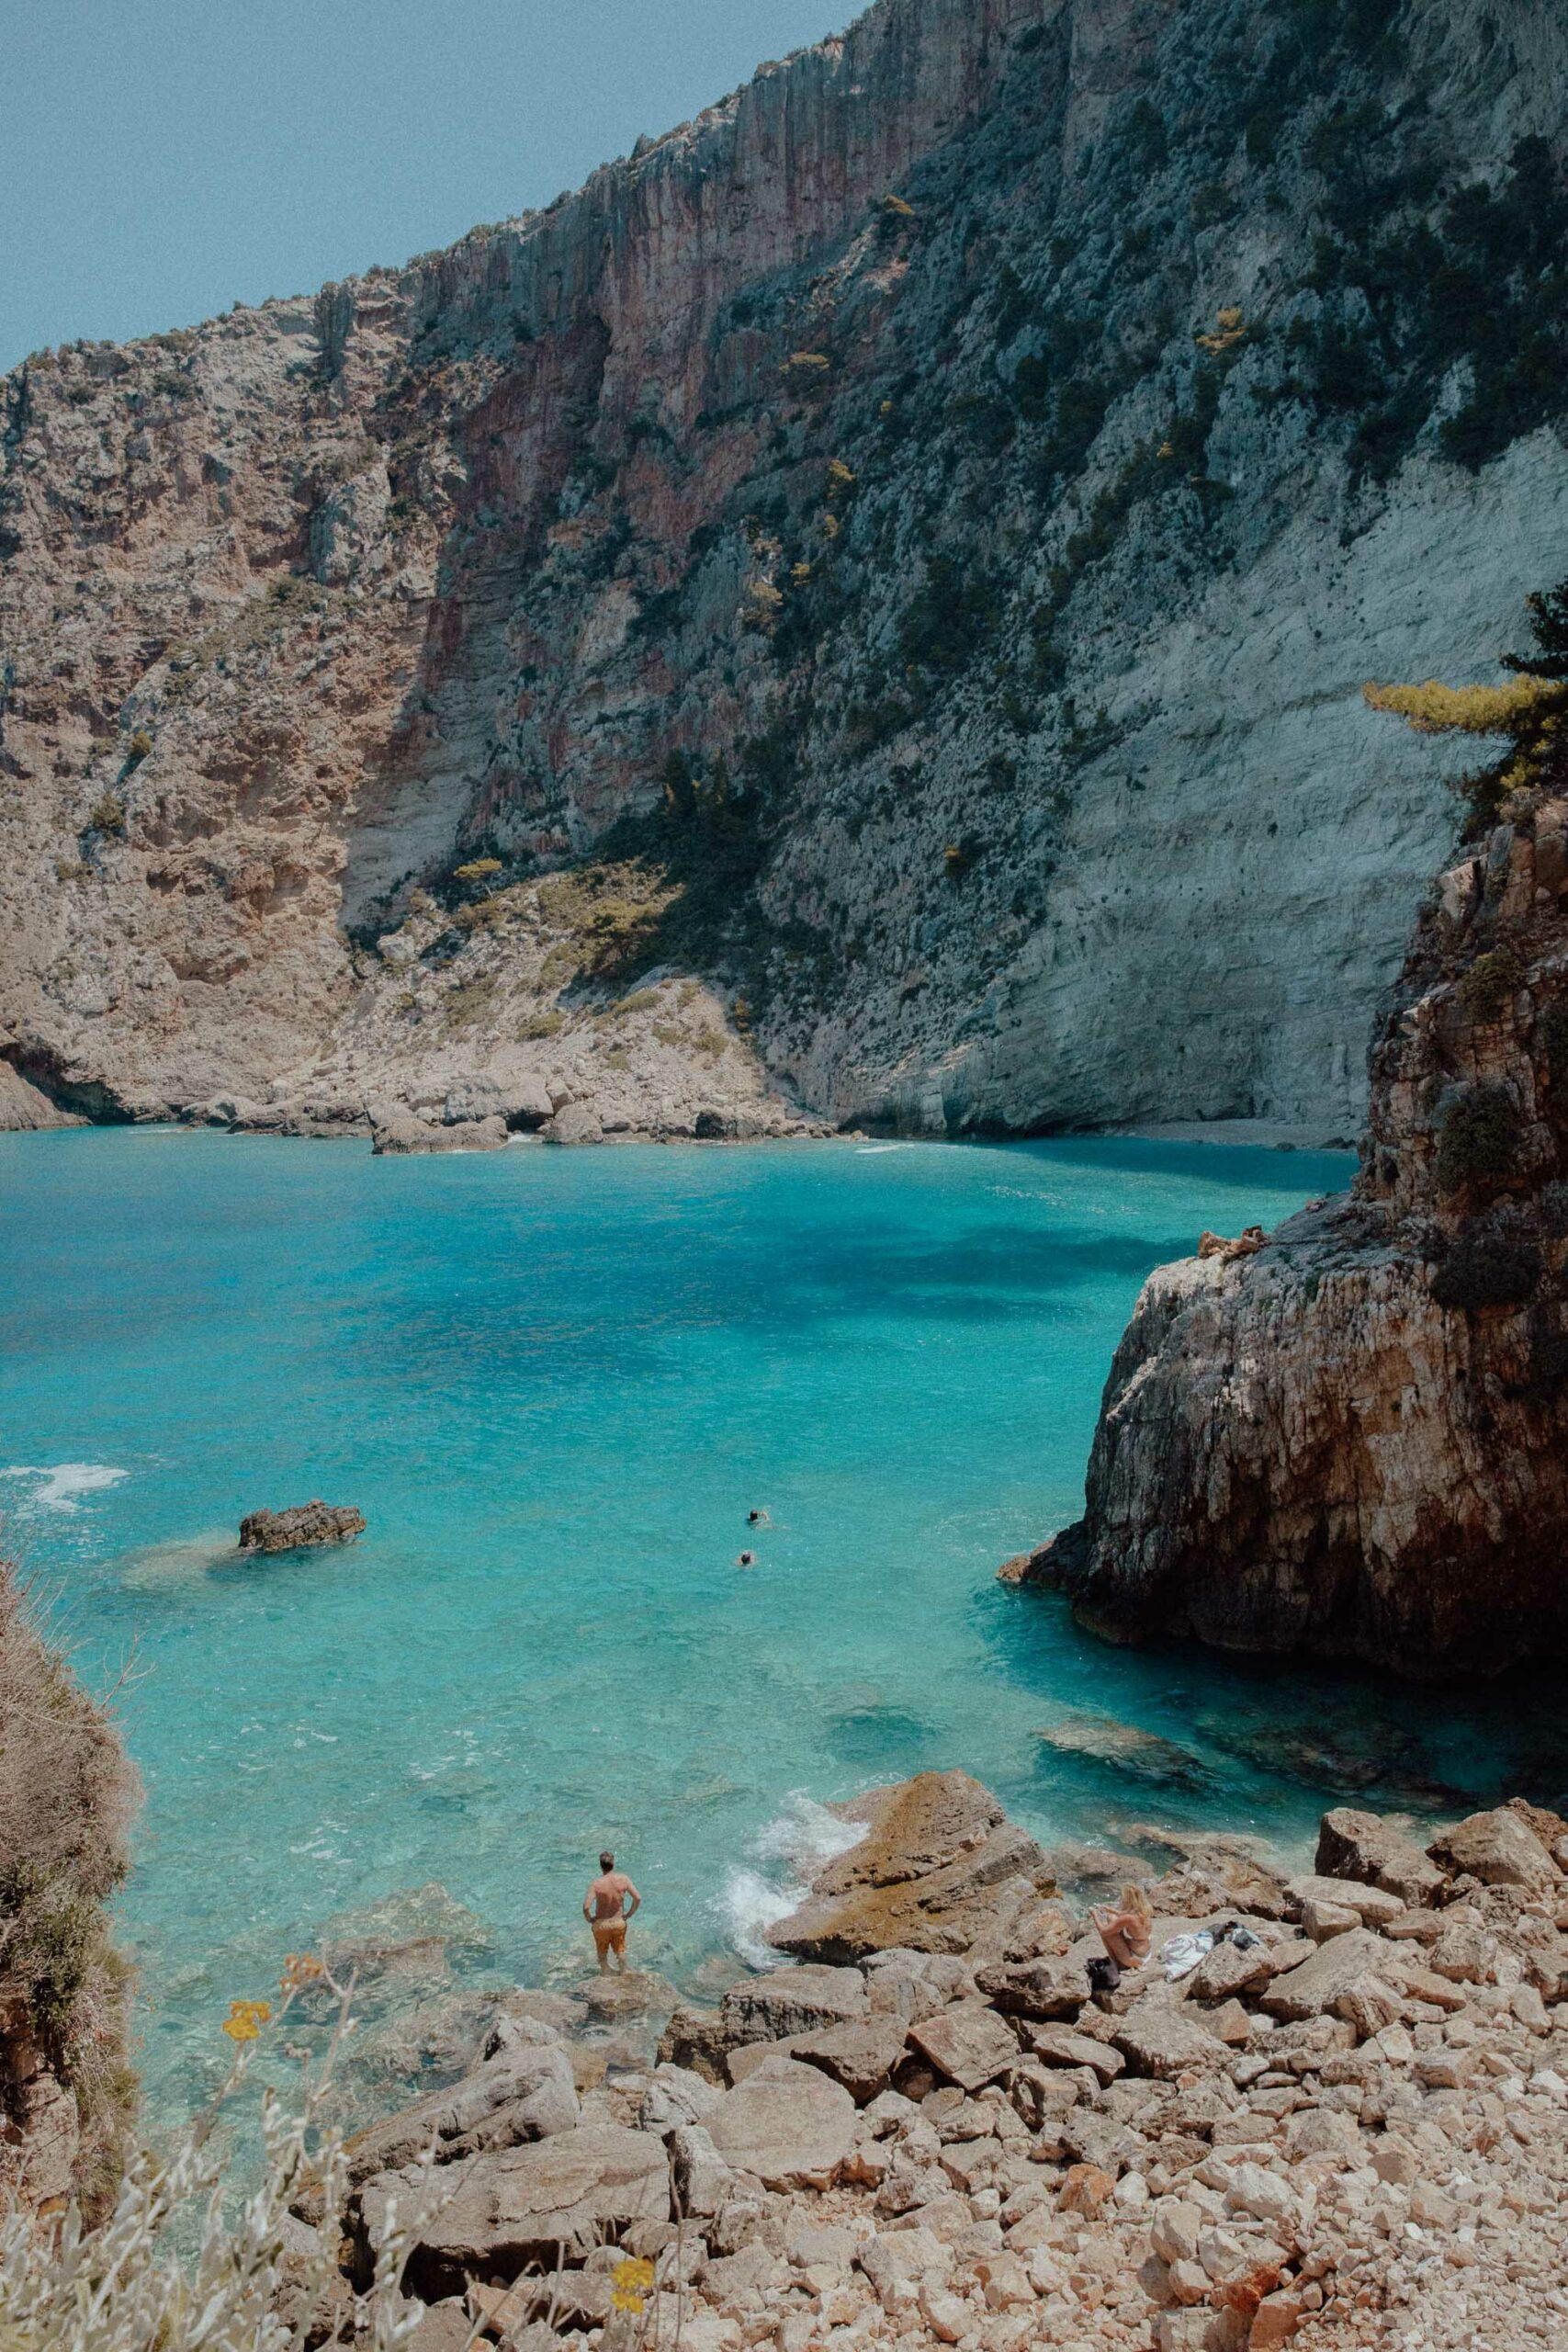 Filippoi beach cove in Zakynthos Greece